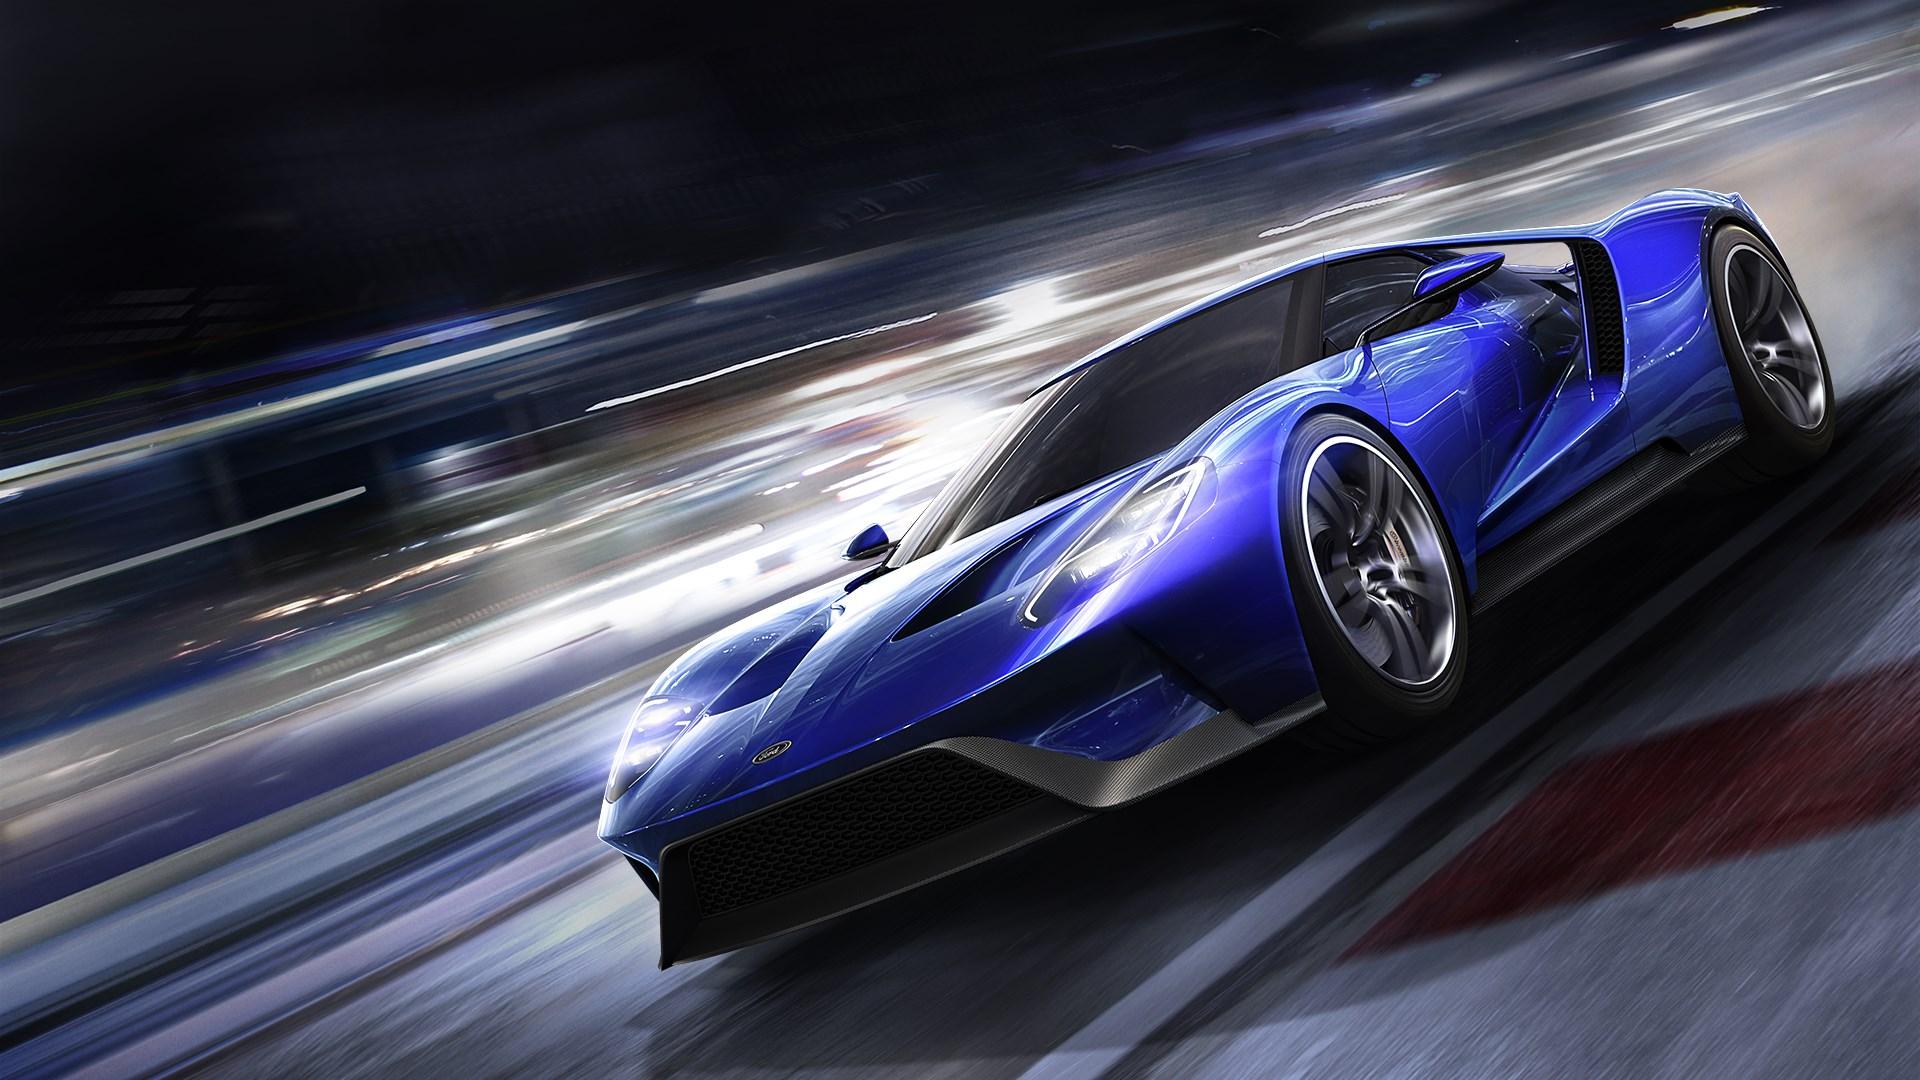 Buy Forza Motorsport 6 - Microsoft Store